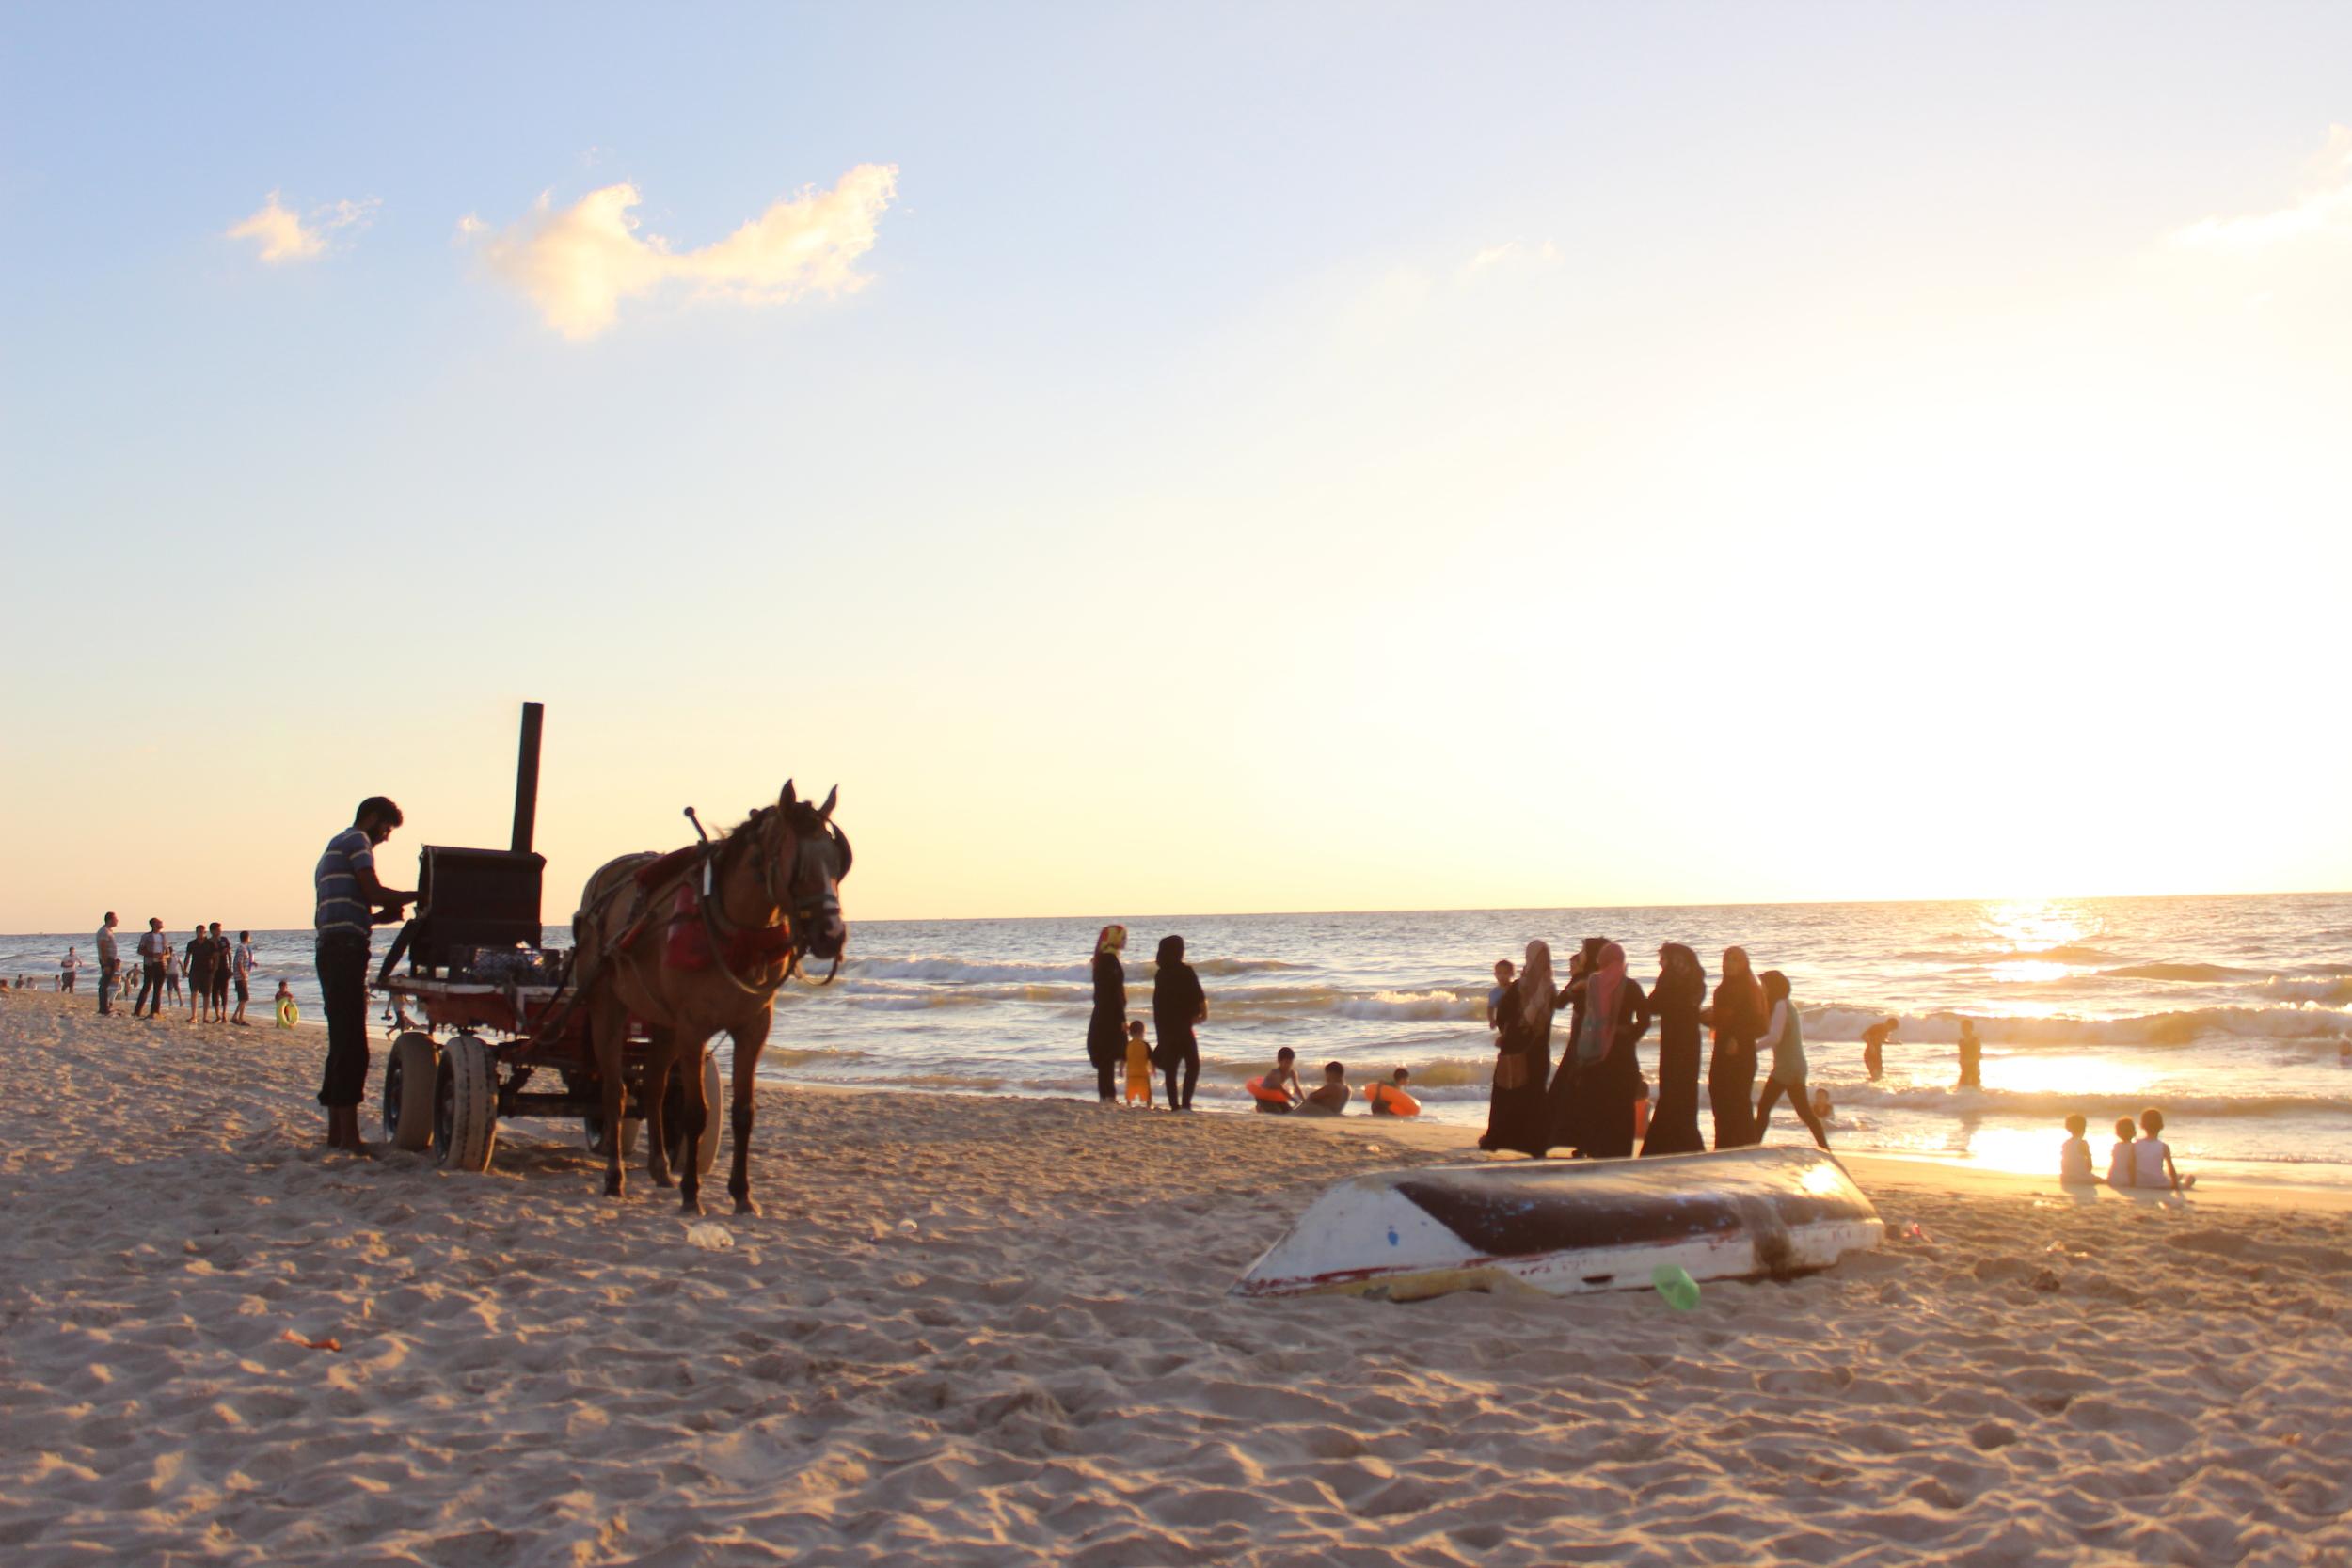 Gaza Beach sunset - full size